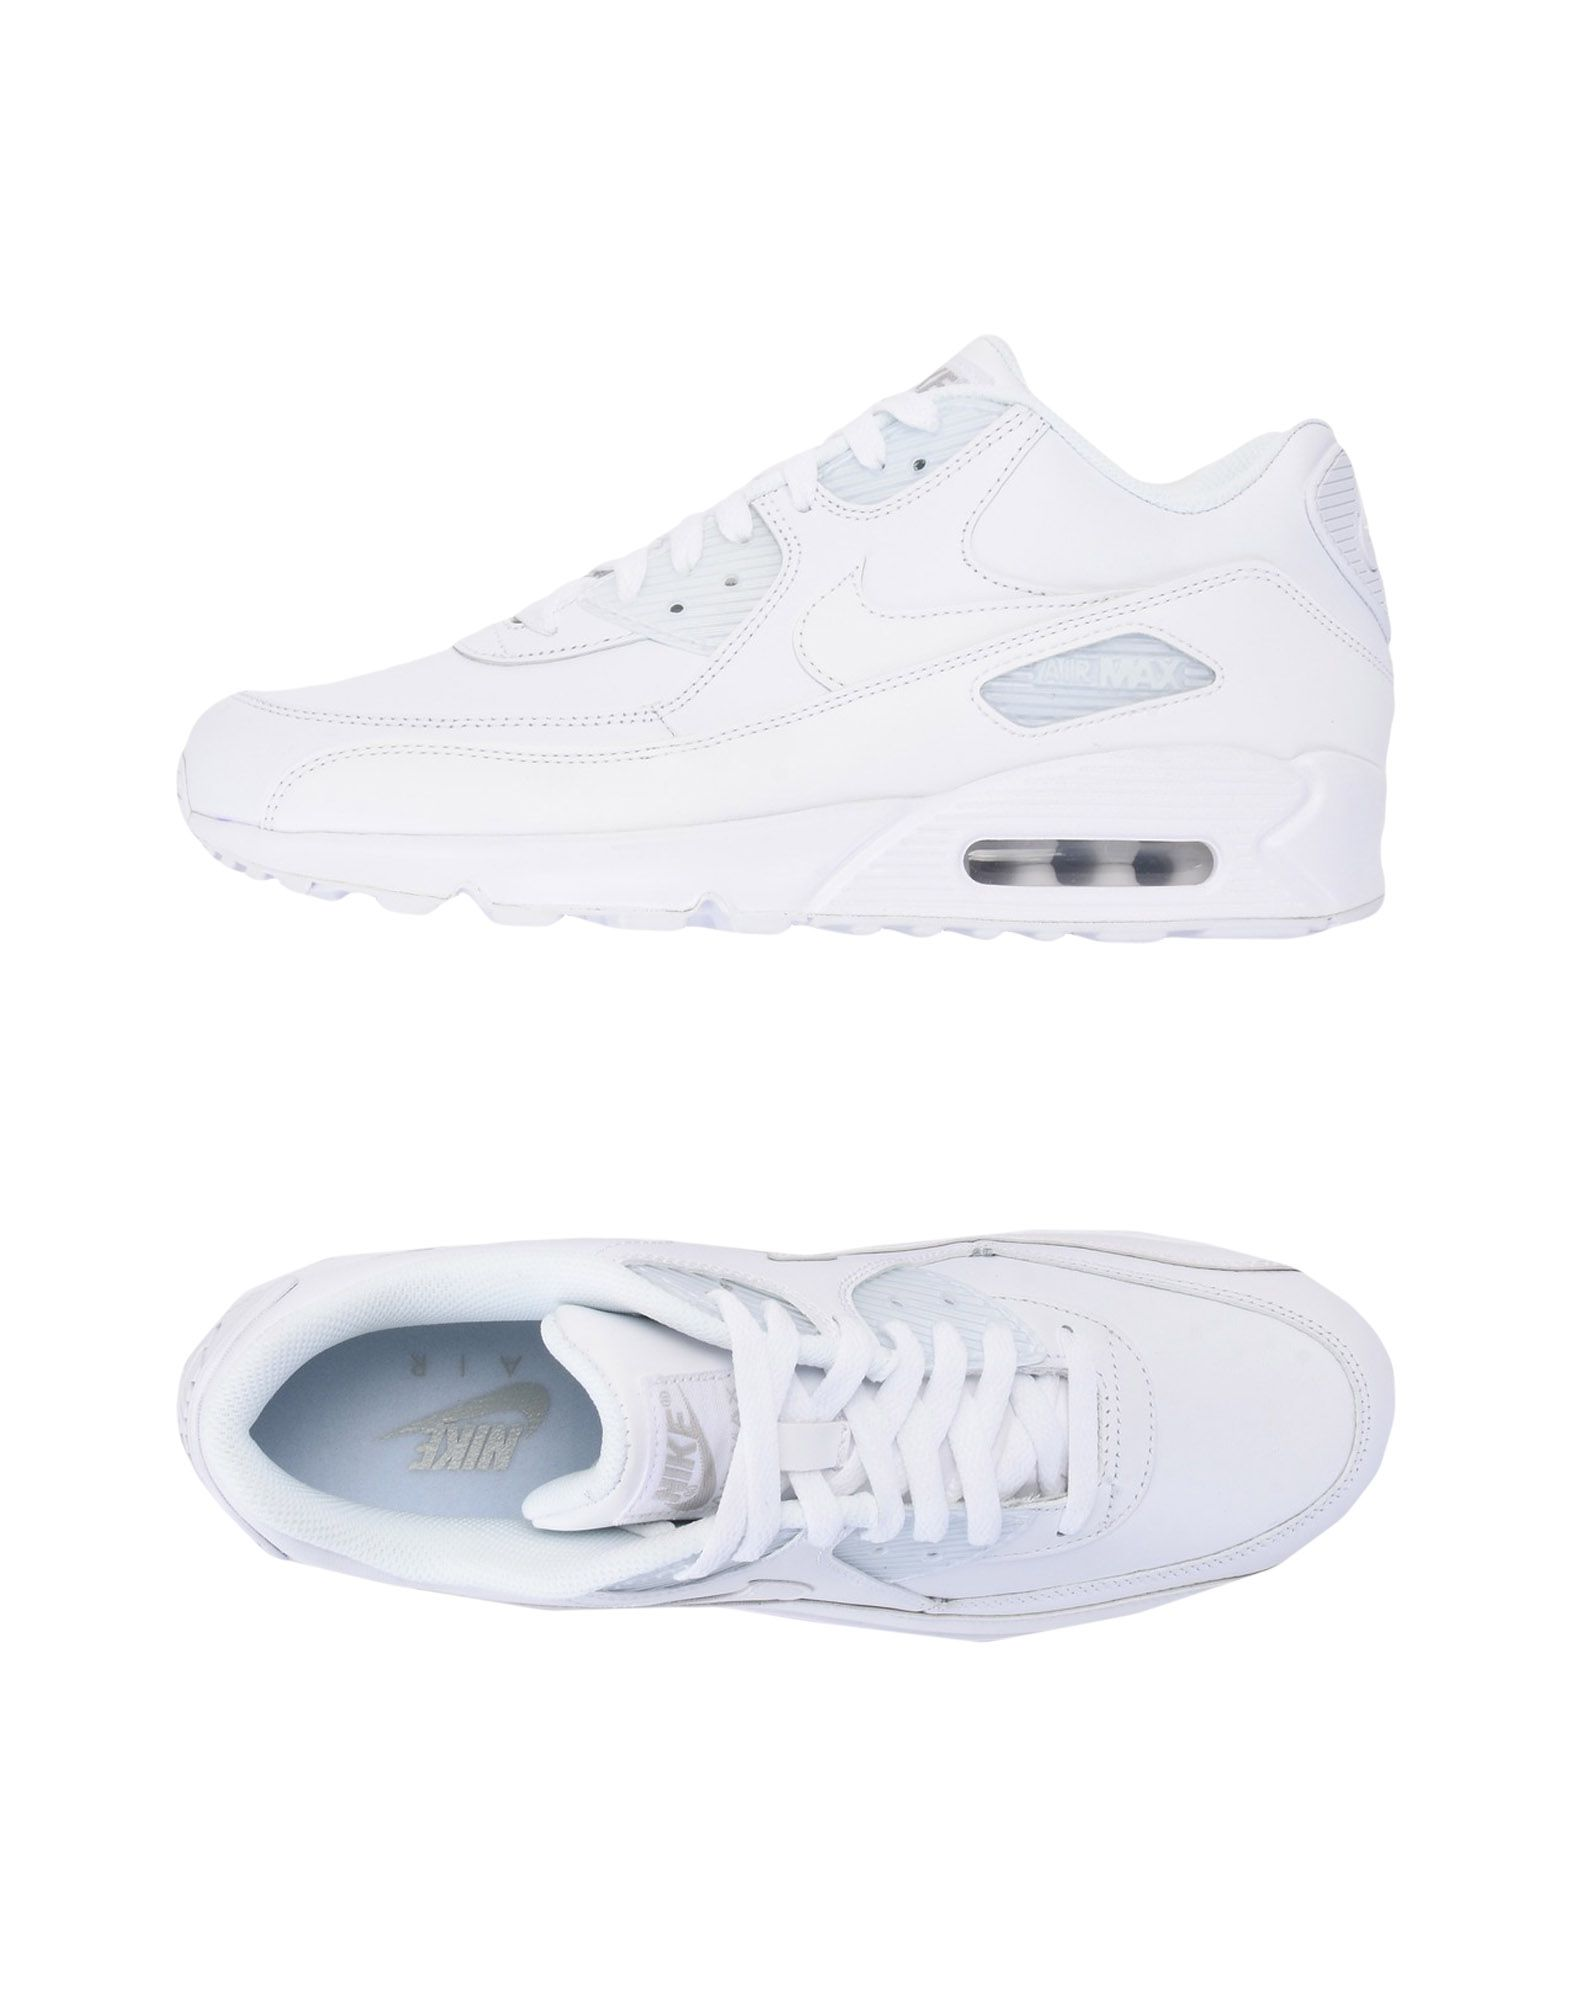 Sneakers Nike Air Max 90 Leather - Uomo - Acquista online su